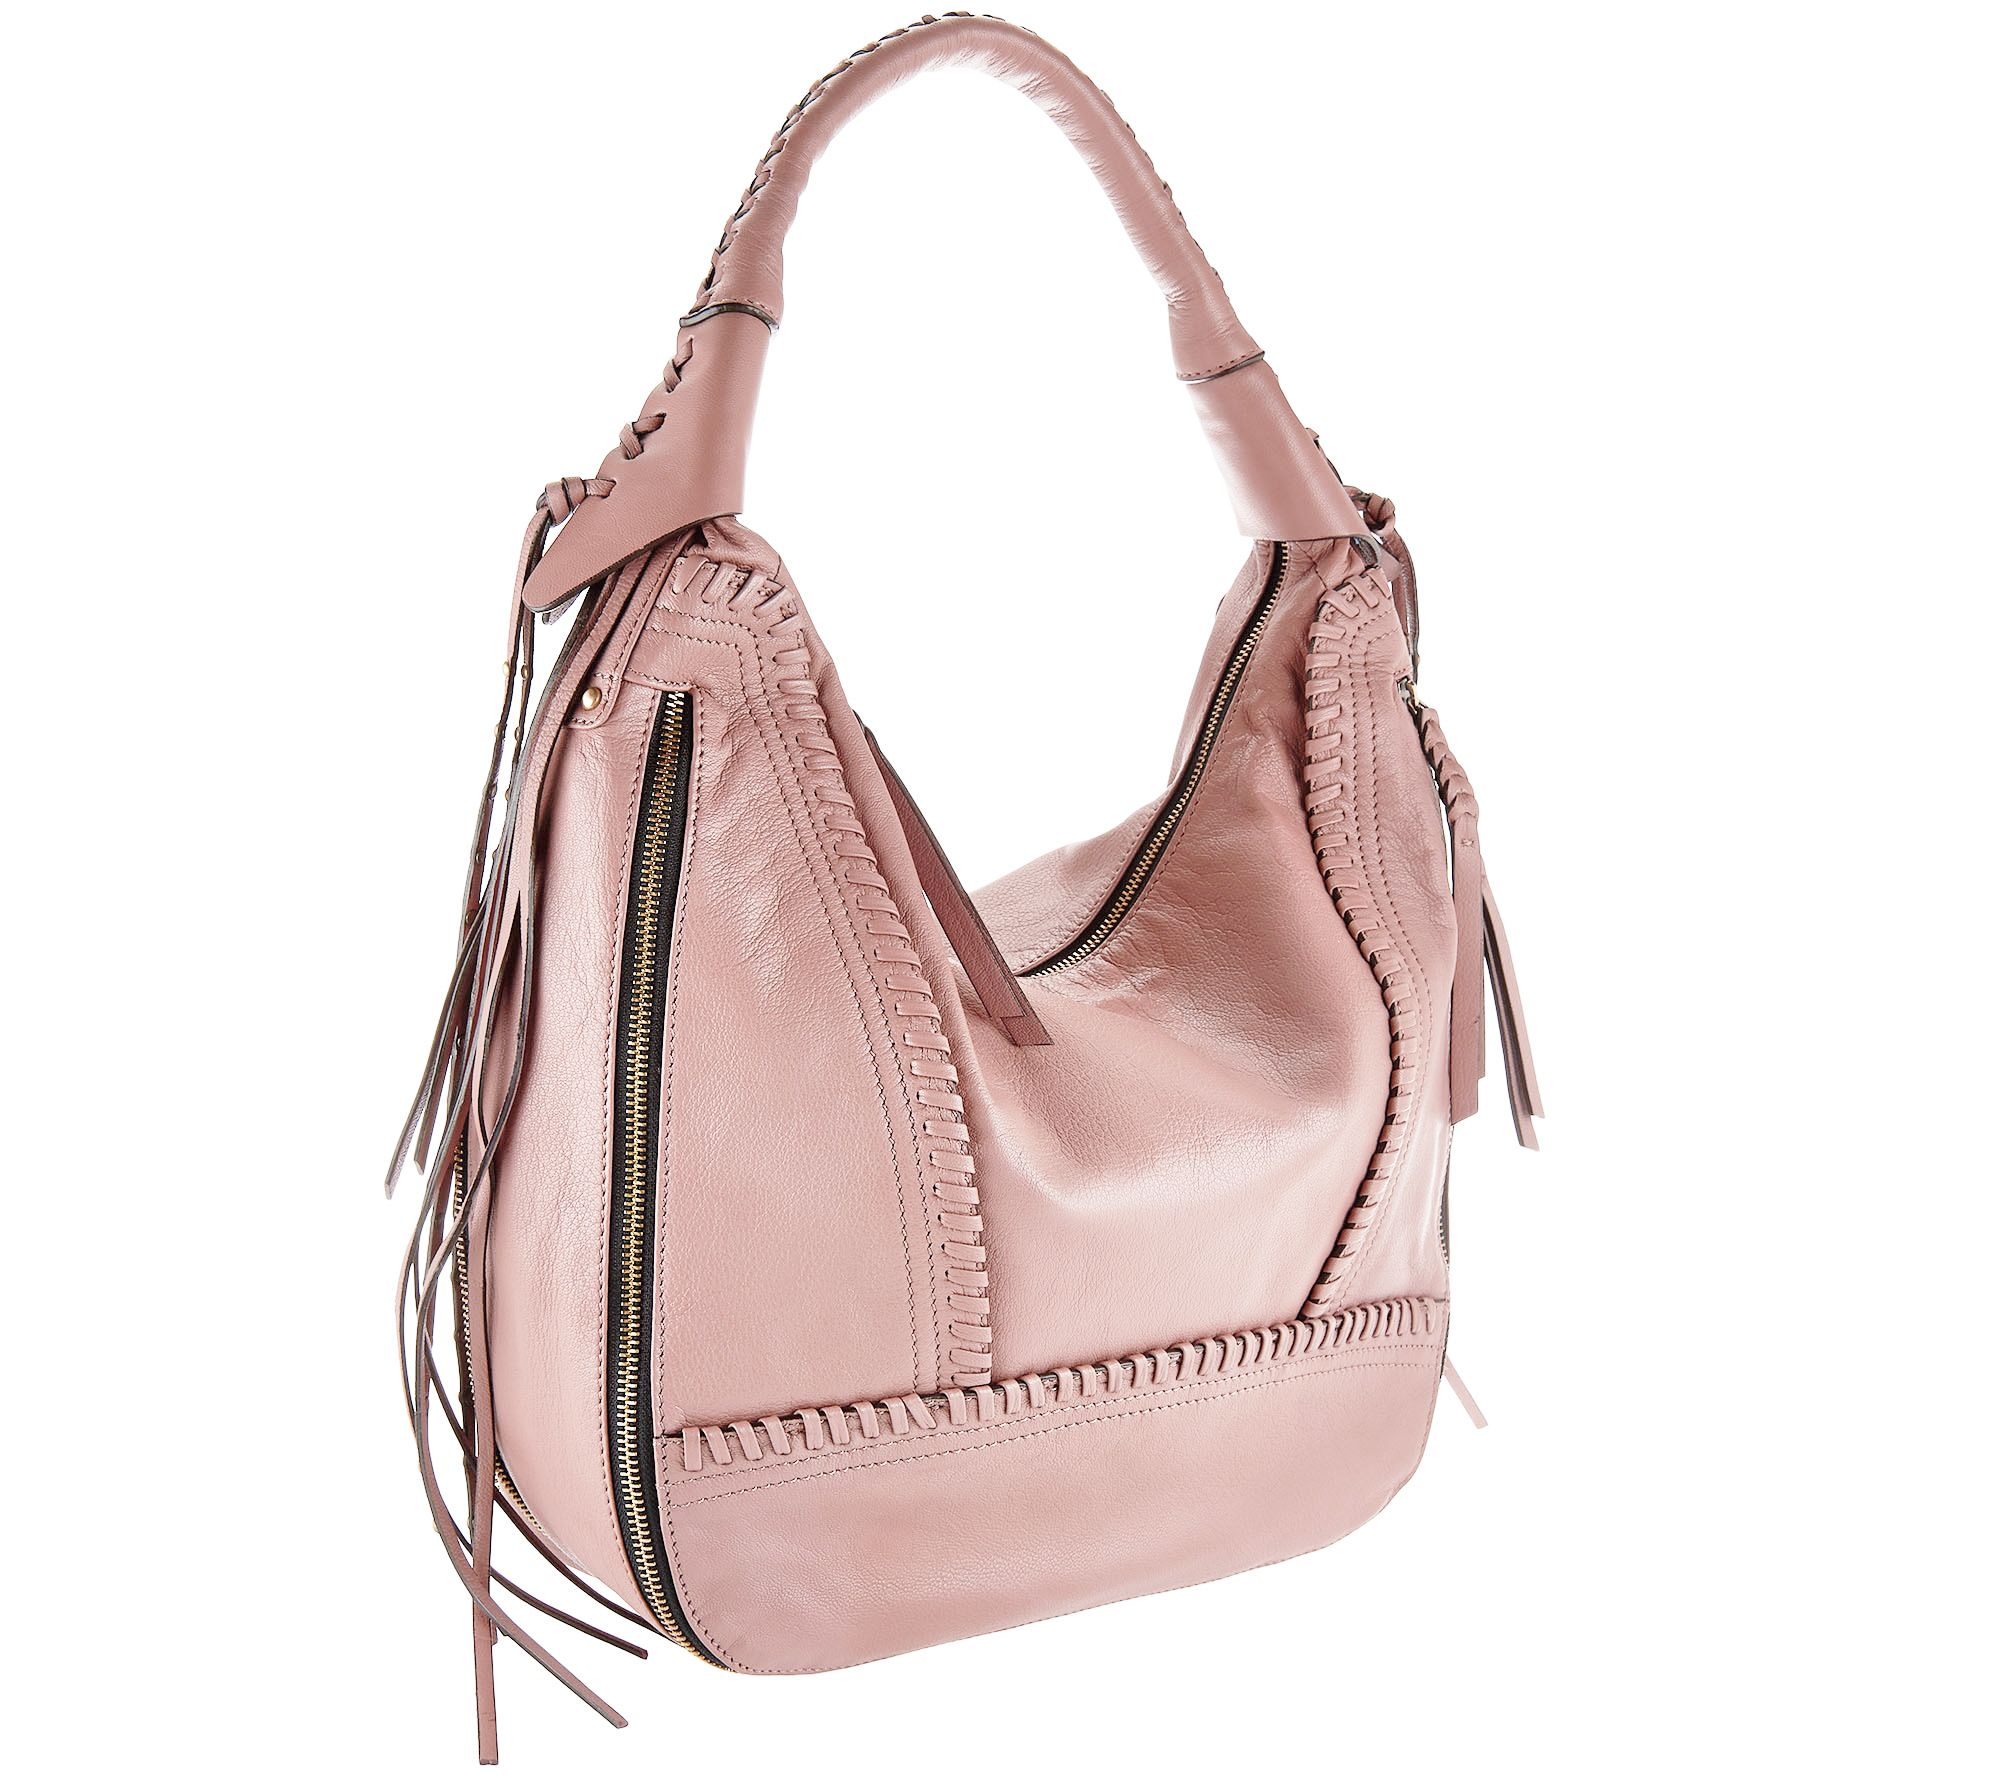 orYANY Soft Nappa Leather Hobo - Michelle - Page 1 — QVC.com ae2149e3728c4